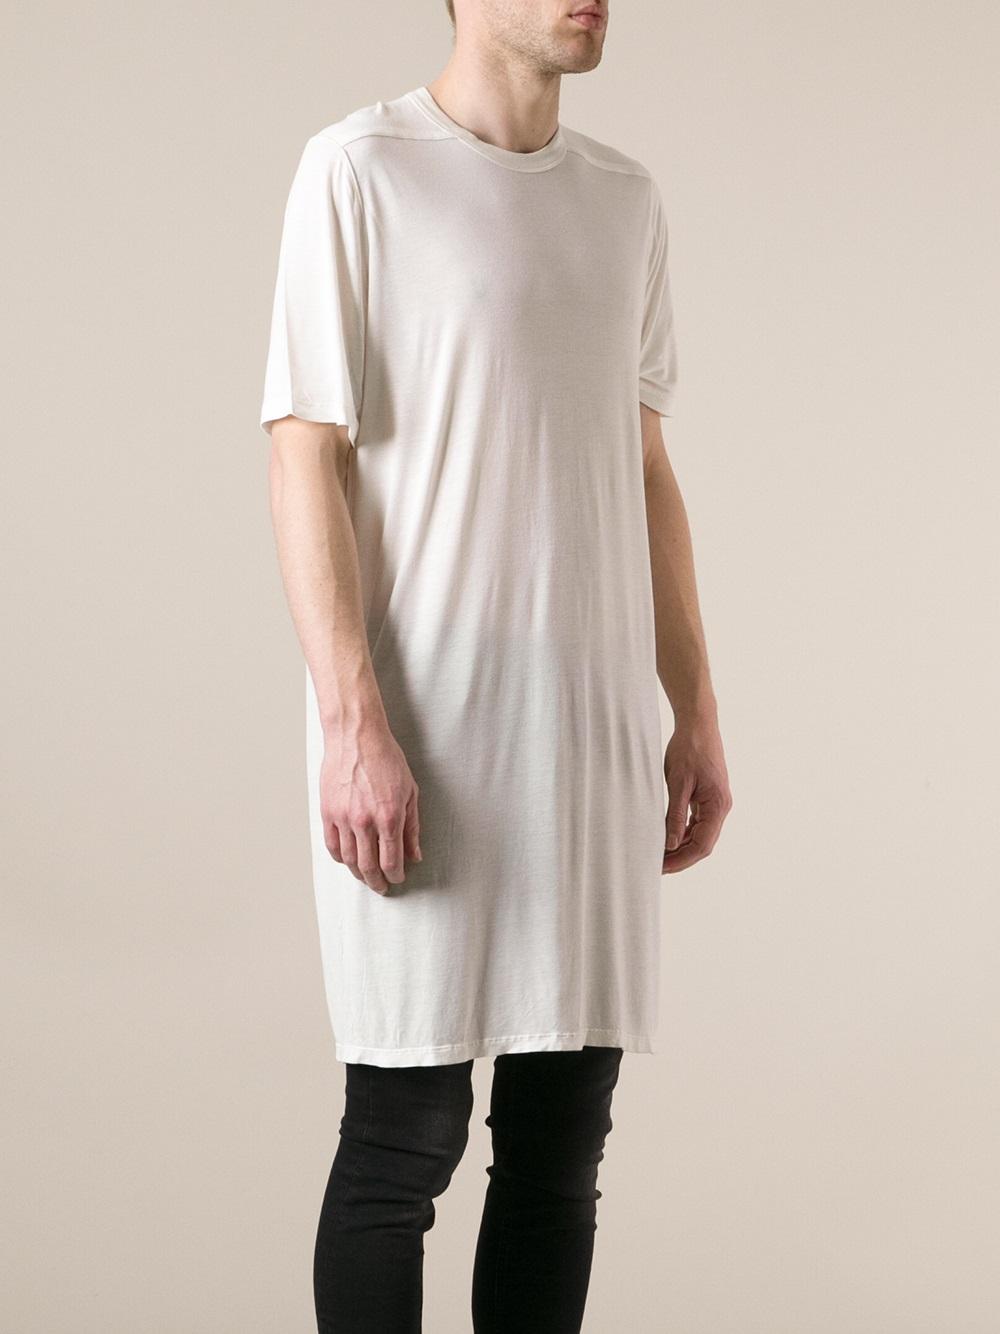 lyst rick owens long tshirt in white for men. Black Bedroom Furniture Sets. Home Design Ideas